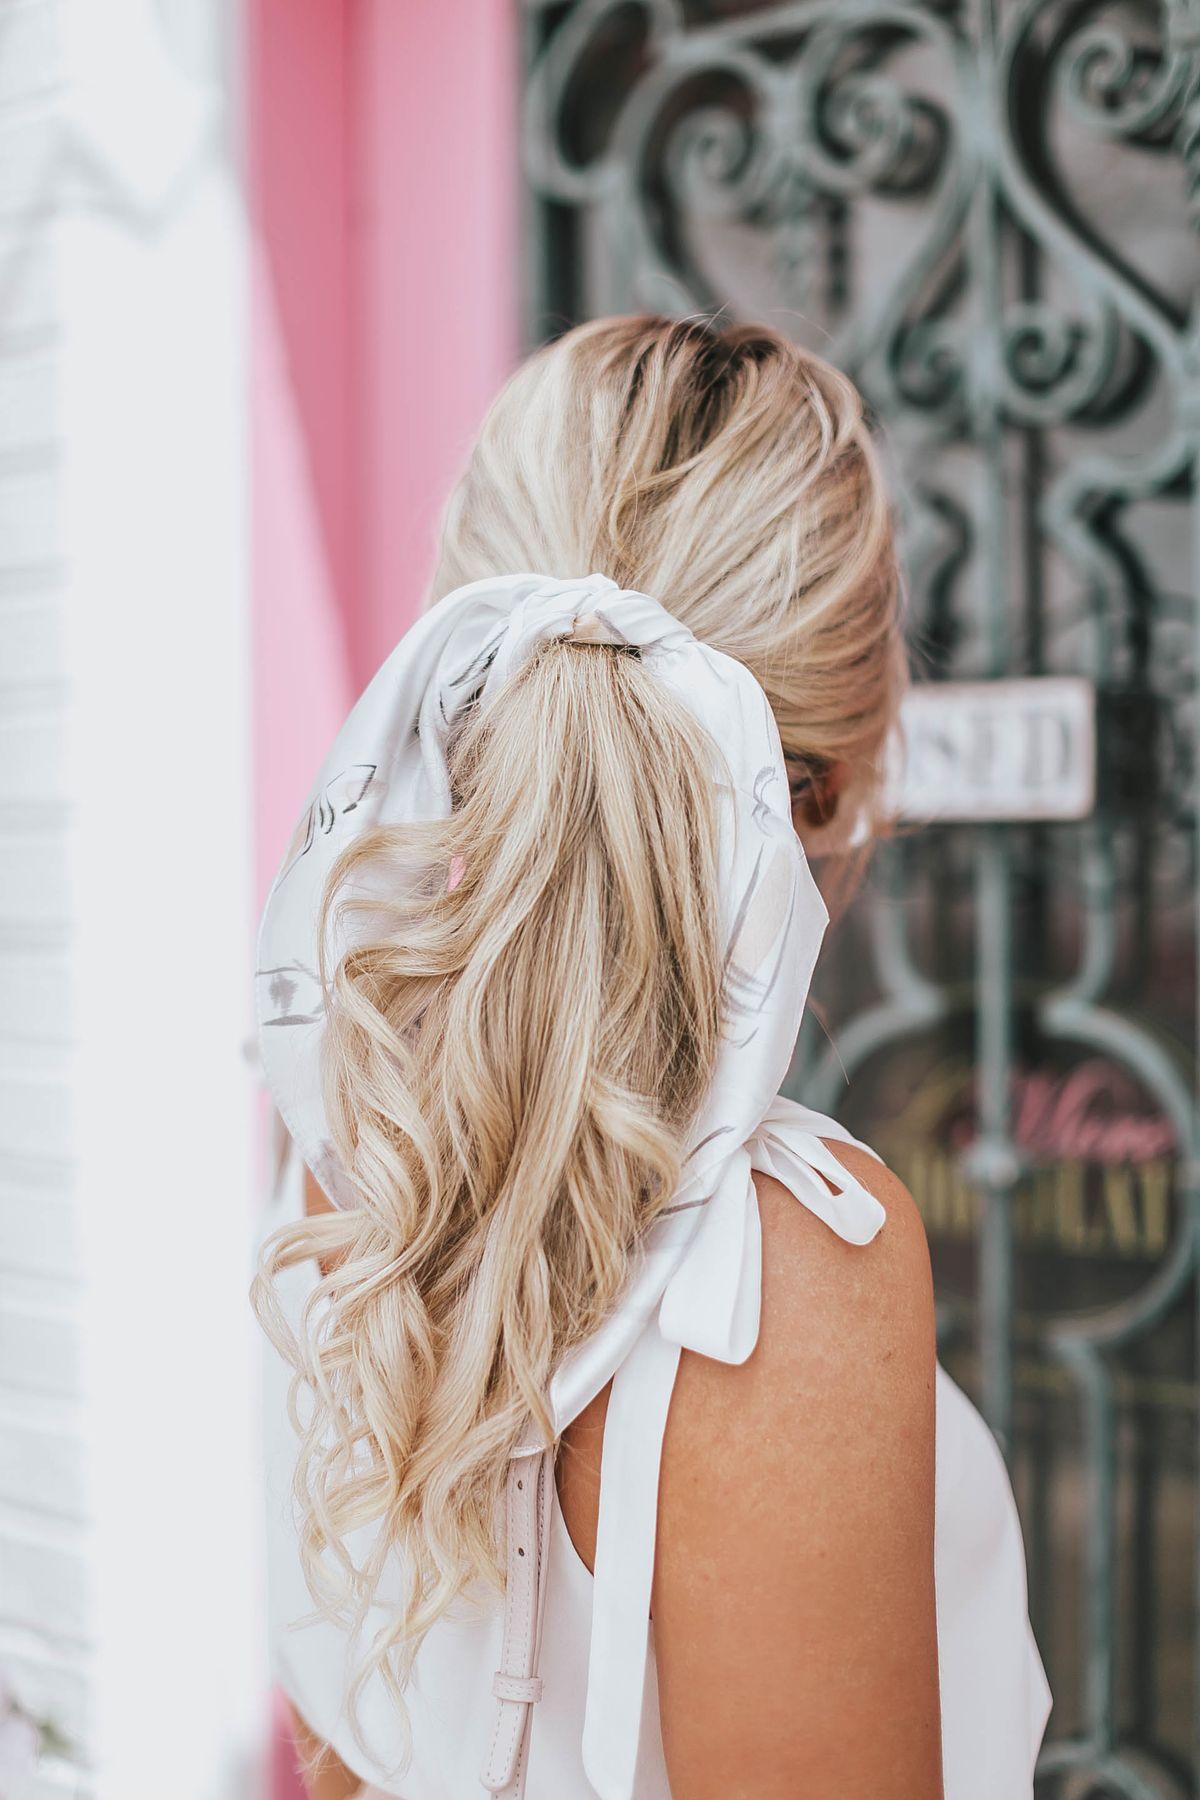 "blonde hair, hairstyles, curly hair, long hair, blondes, ashy blonde, balayage, full foil, hair, blogger, hair scarf, fashion, style, influencer, preppy<p><a href=""http://www.homeinteriordesign.org/2018/02/short-guide-to-interior-decoration.html"">Short guide to interior decoration</a></p>"